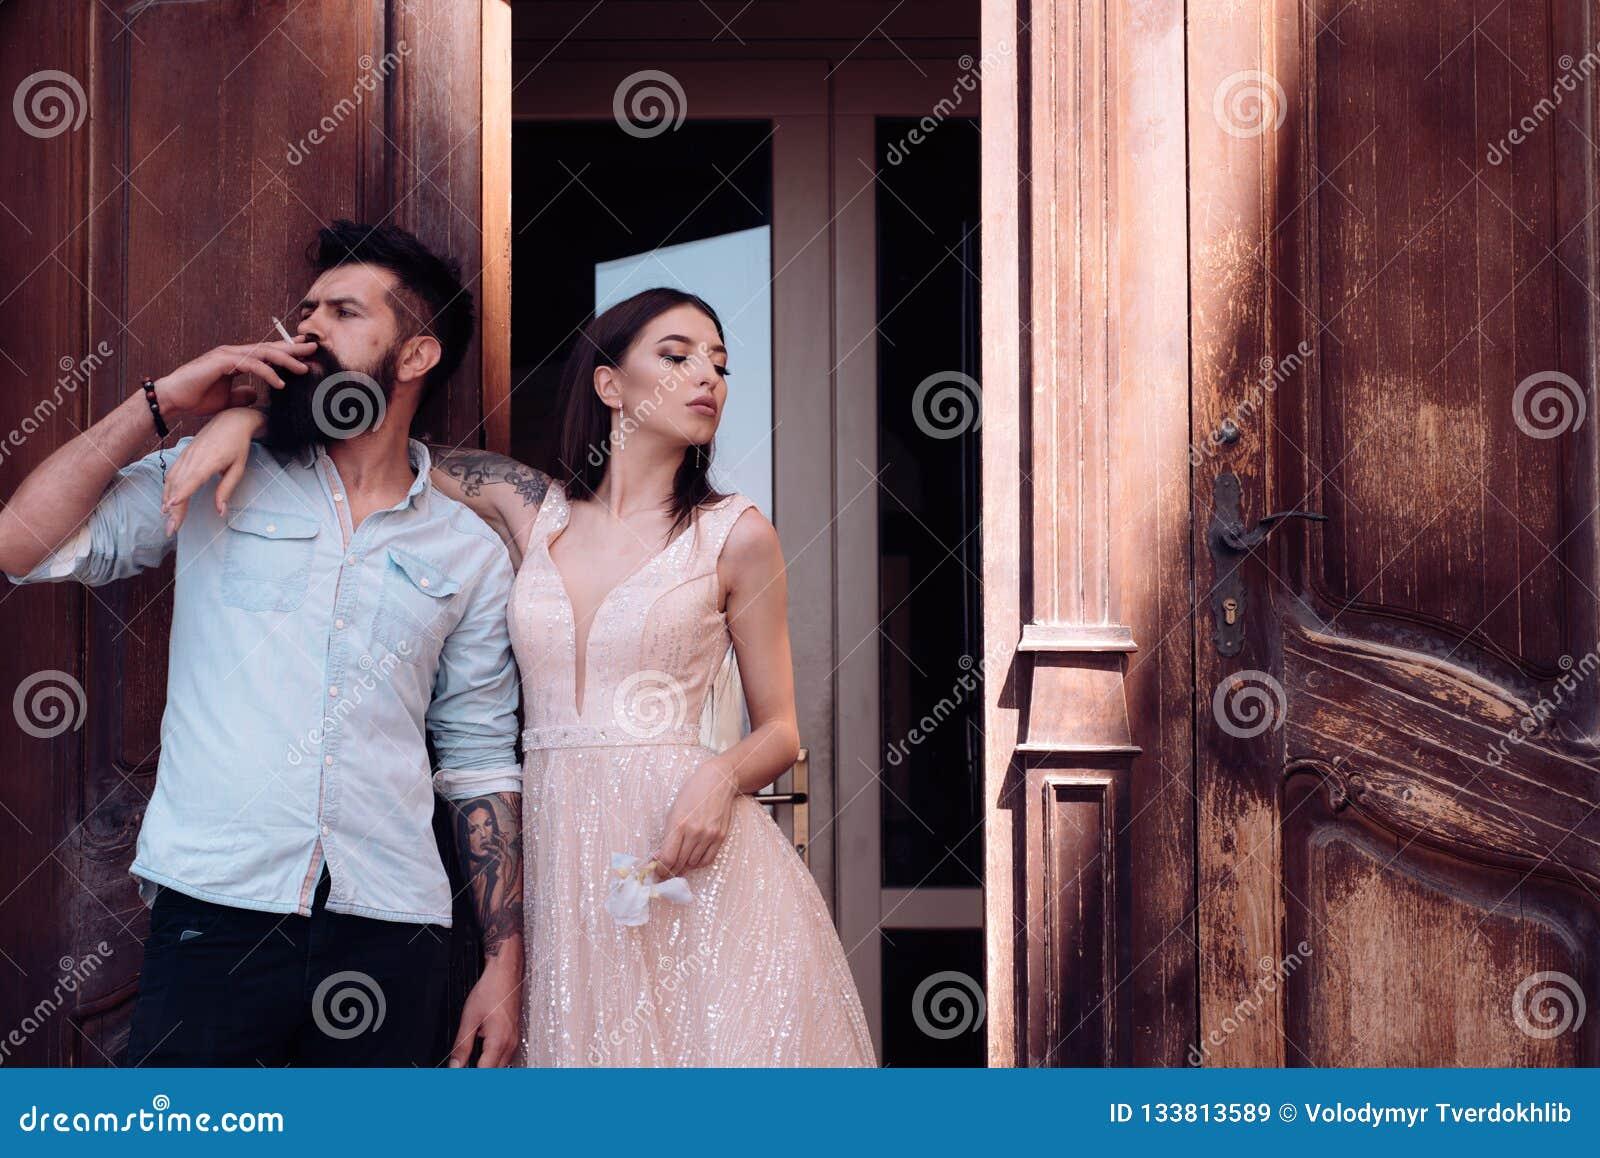 Smoking addiction. Couple in love have smoking break. Romantic couple of sensual woman and bearded man smoke outdoor